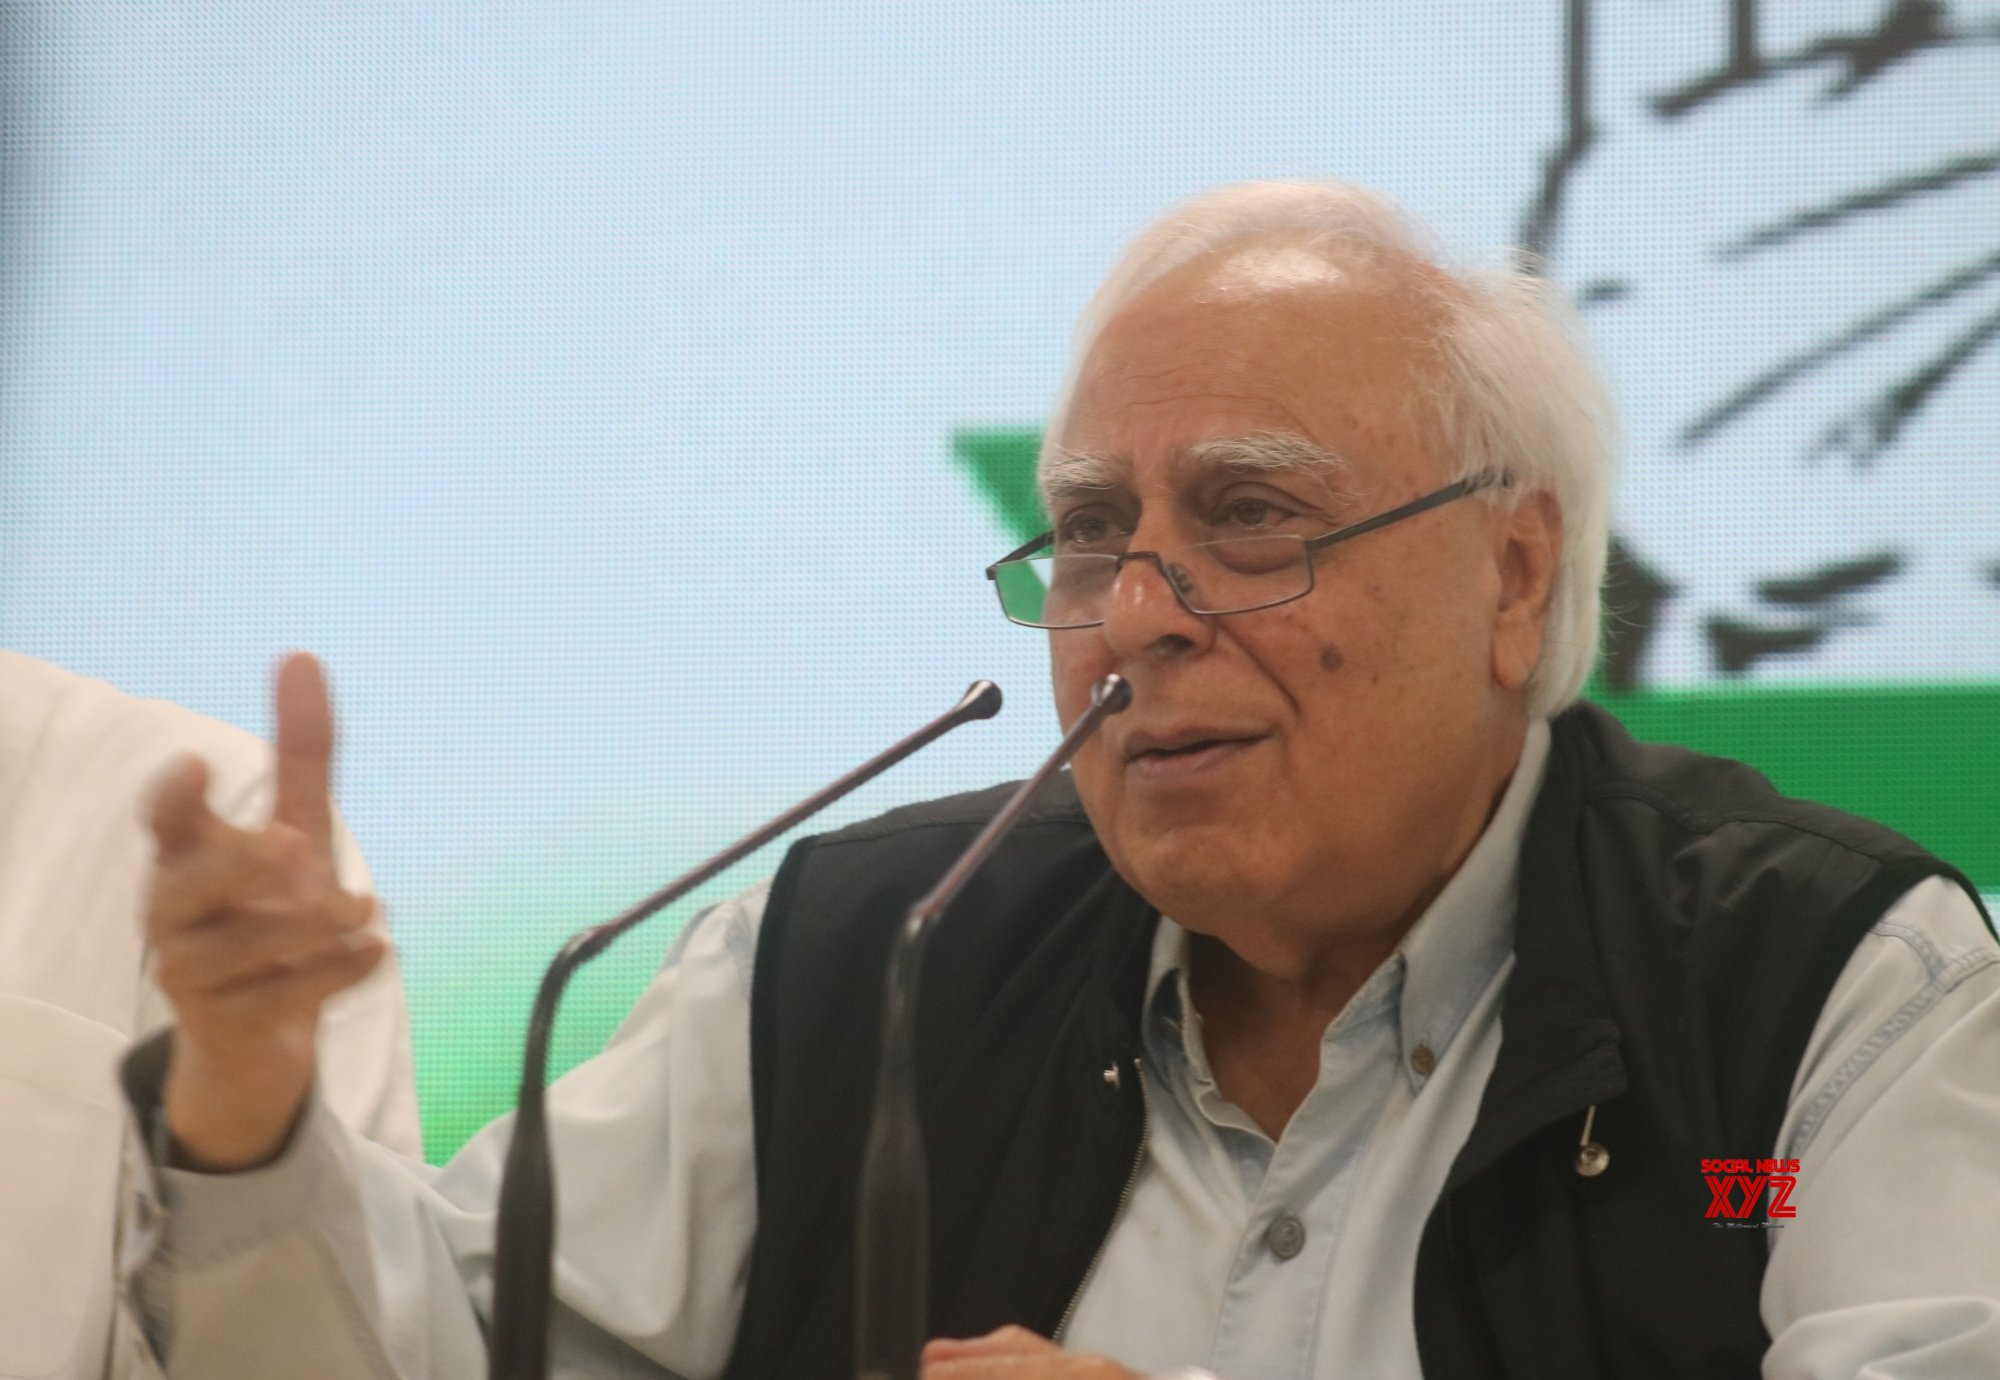 New Delhi: Kapil Sibal's press conference #Gallery